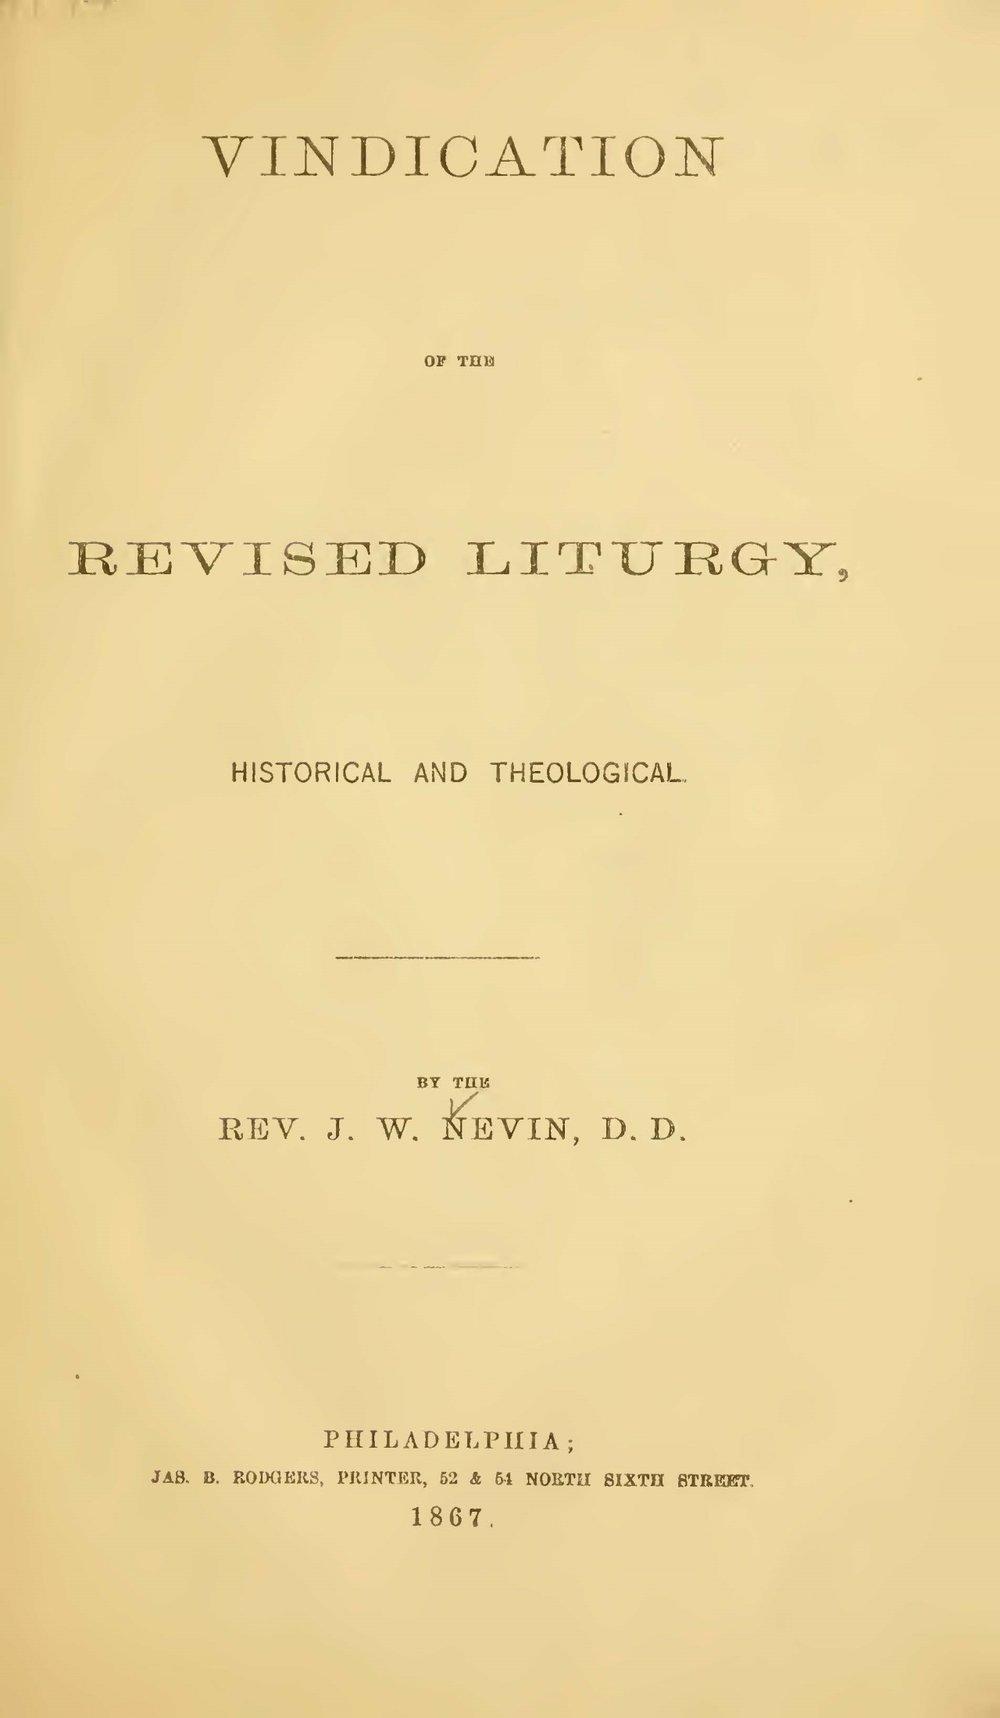 Nevin, John Williamson, Vindication of the Revised Liturgy Title Page.jpg